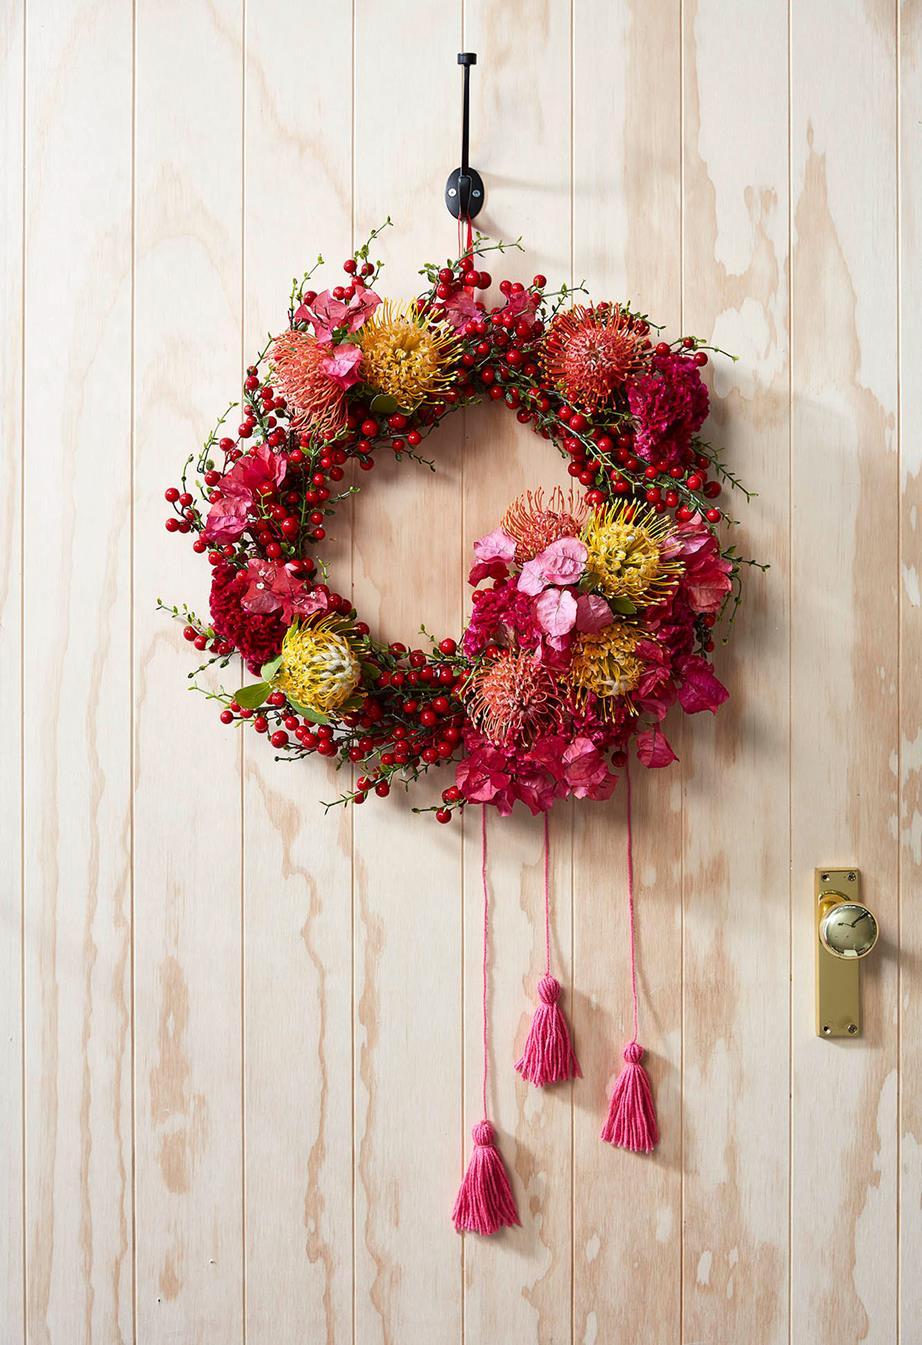 Australian wreath